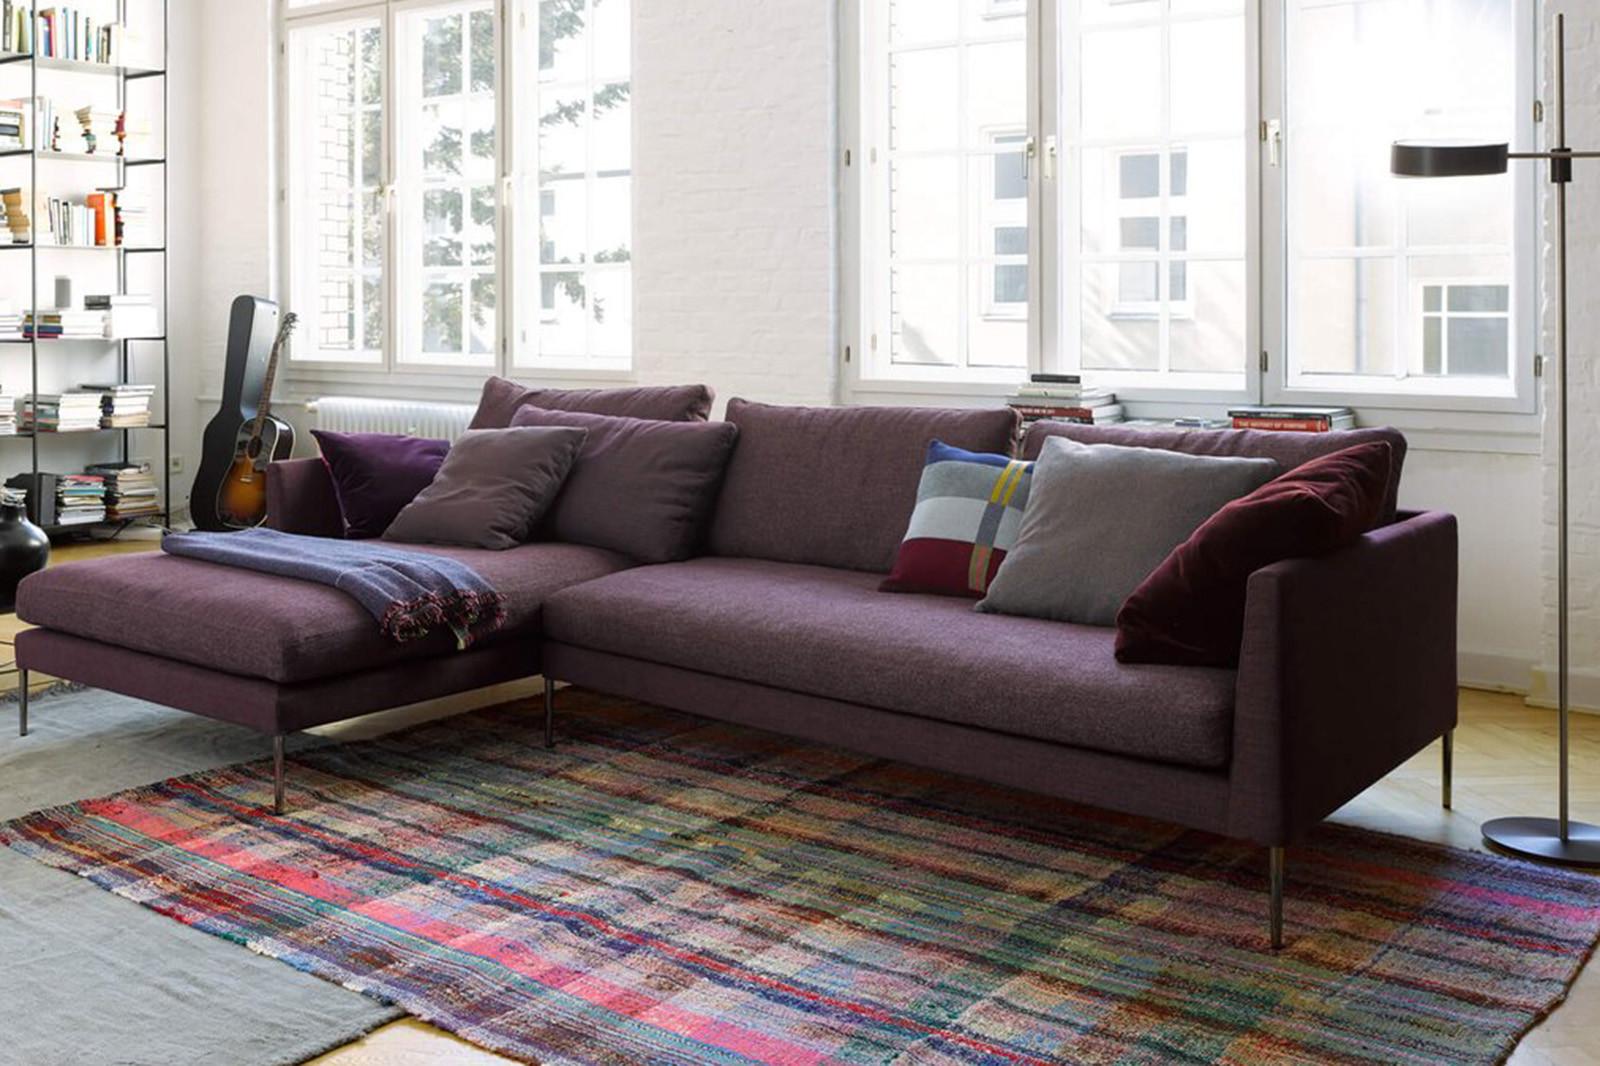 Mehrzahl Sofa  Sofa Bodennah Affordable Sofa Mod Alina Zurck With Sofa